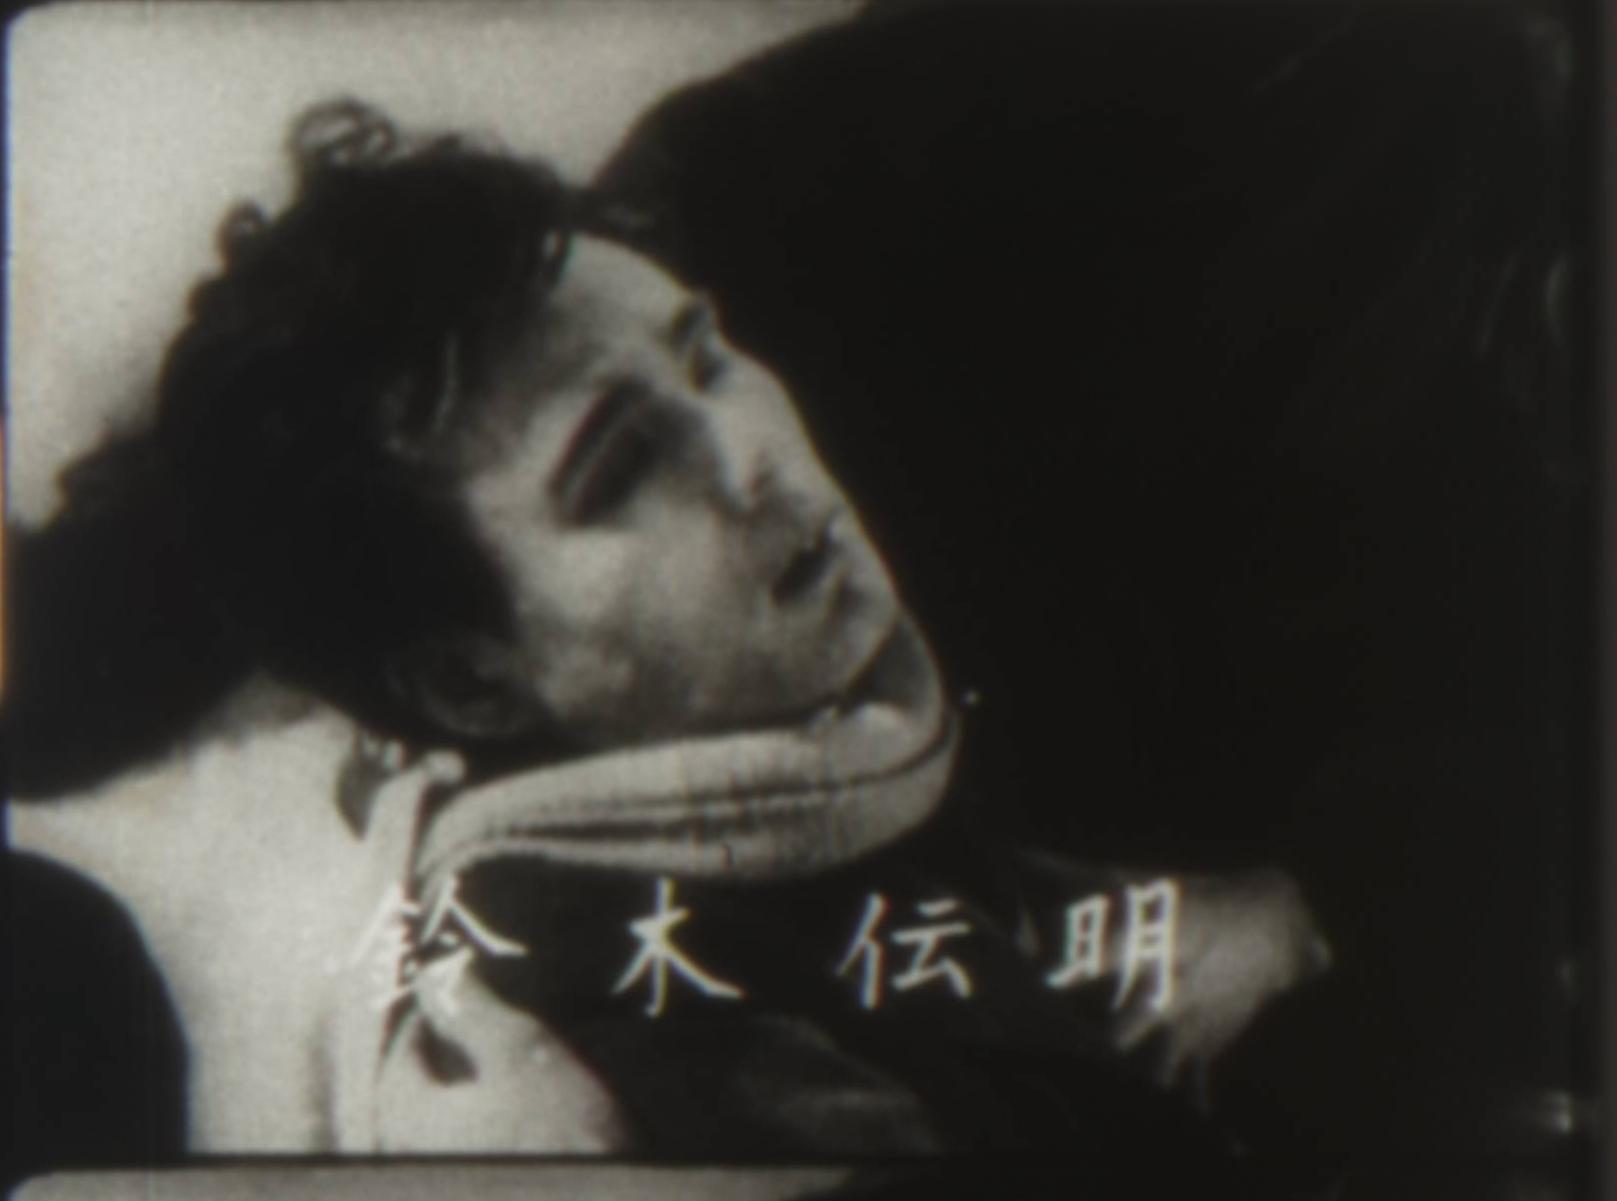 日本映画史24 - 路上の霊魂02